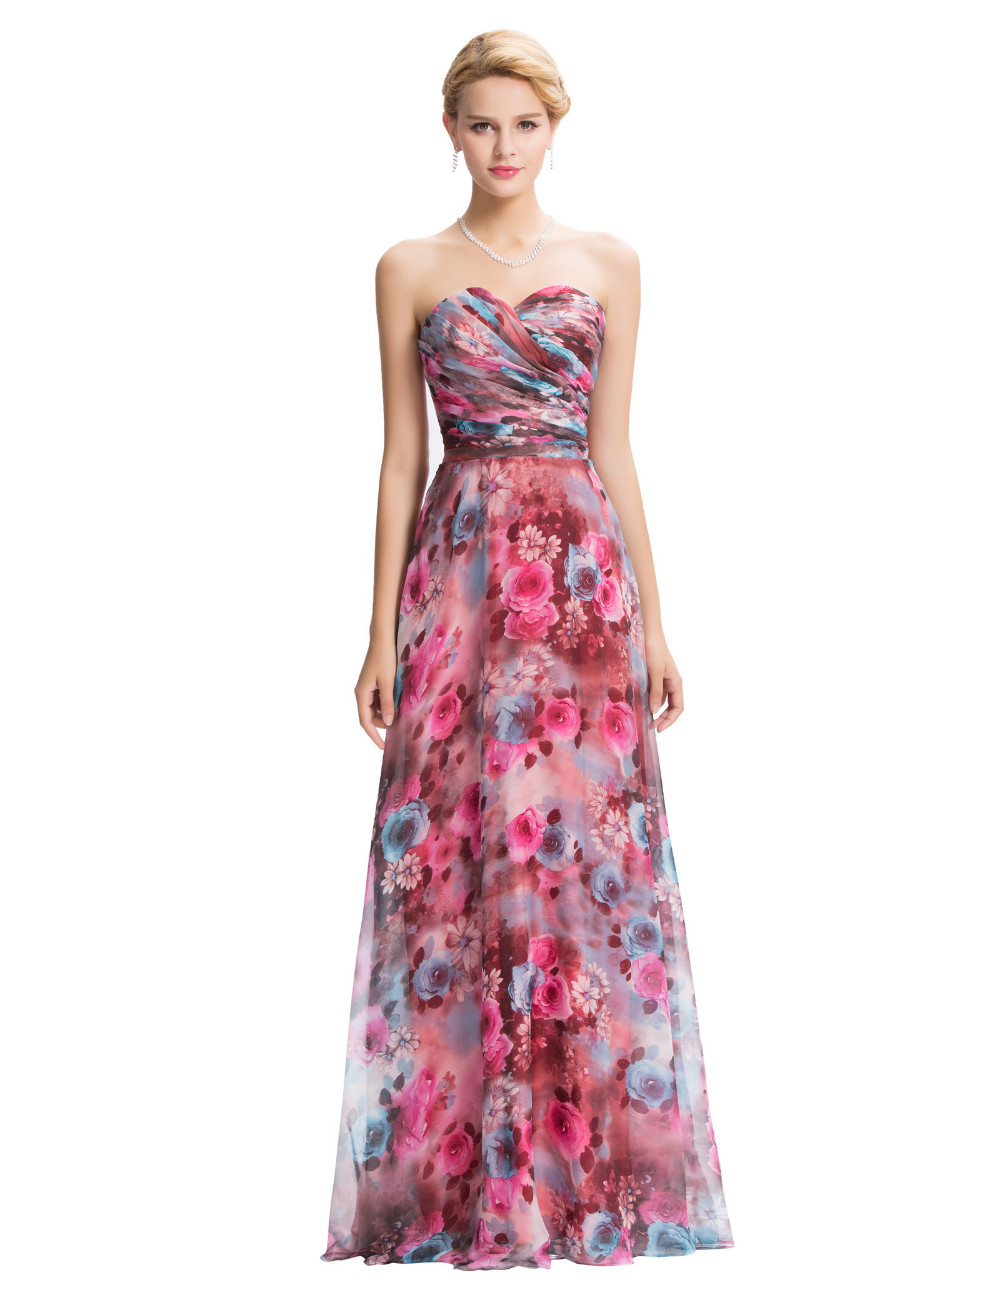 Grace Karin Floral Print Long Evening Dress 2016 Double V Neck ... 1cedd5d2f503